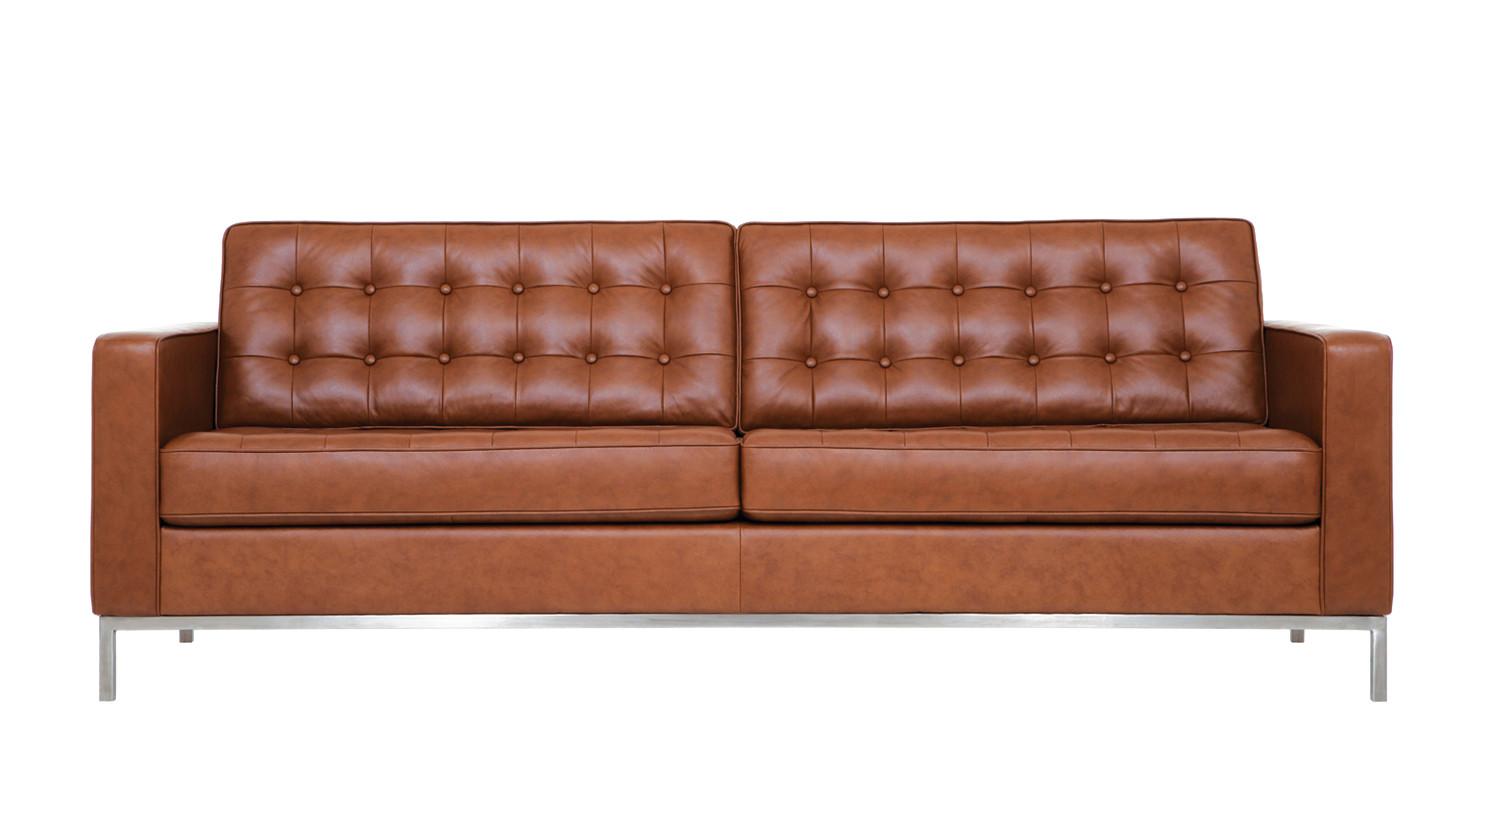 sleeper-sofa-austin-tx-photo-14